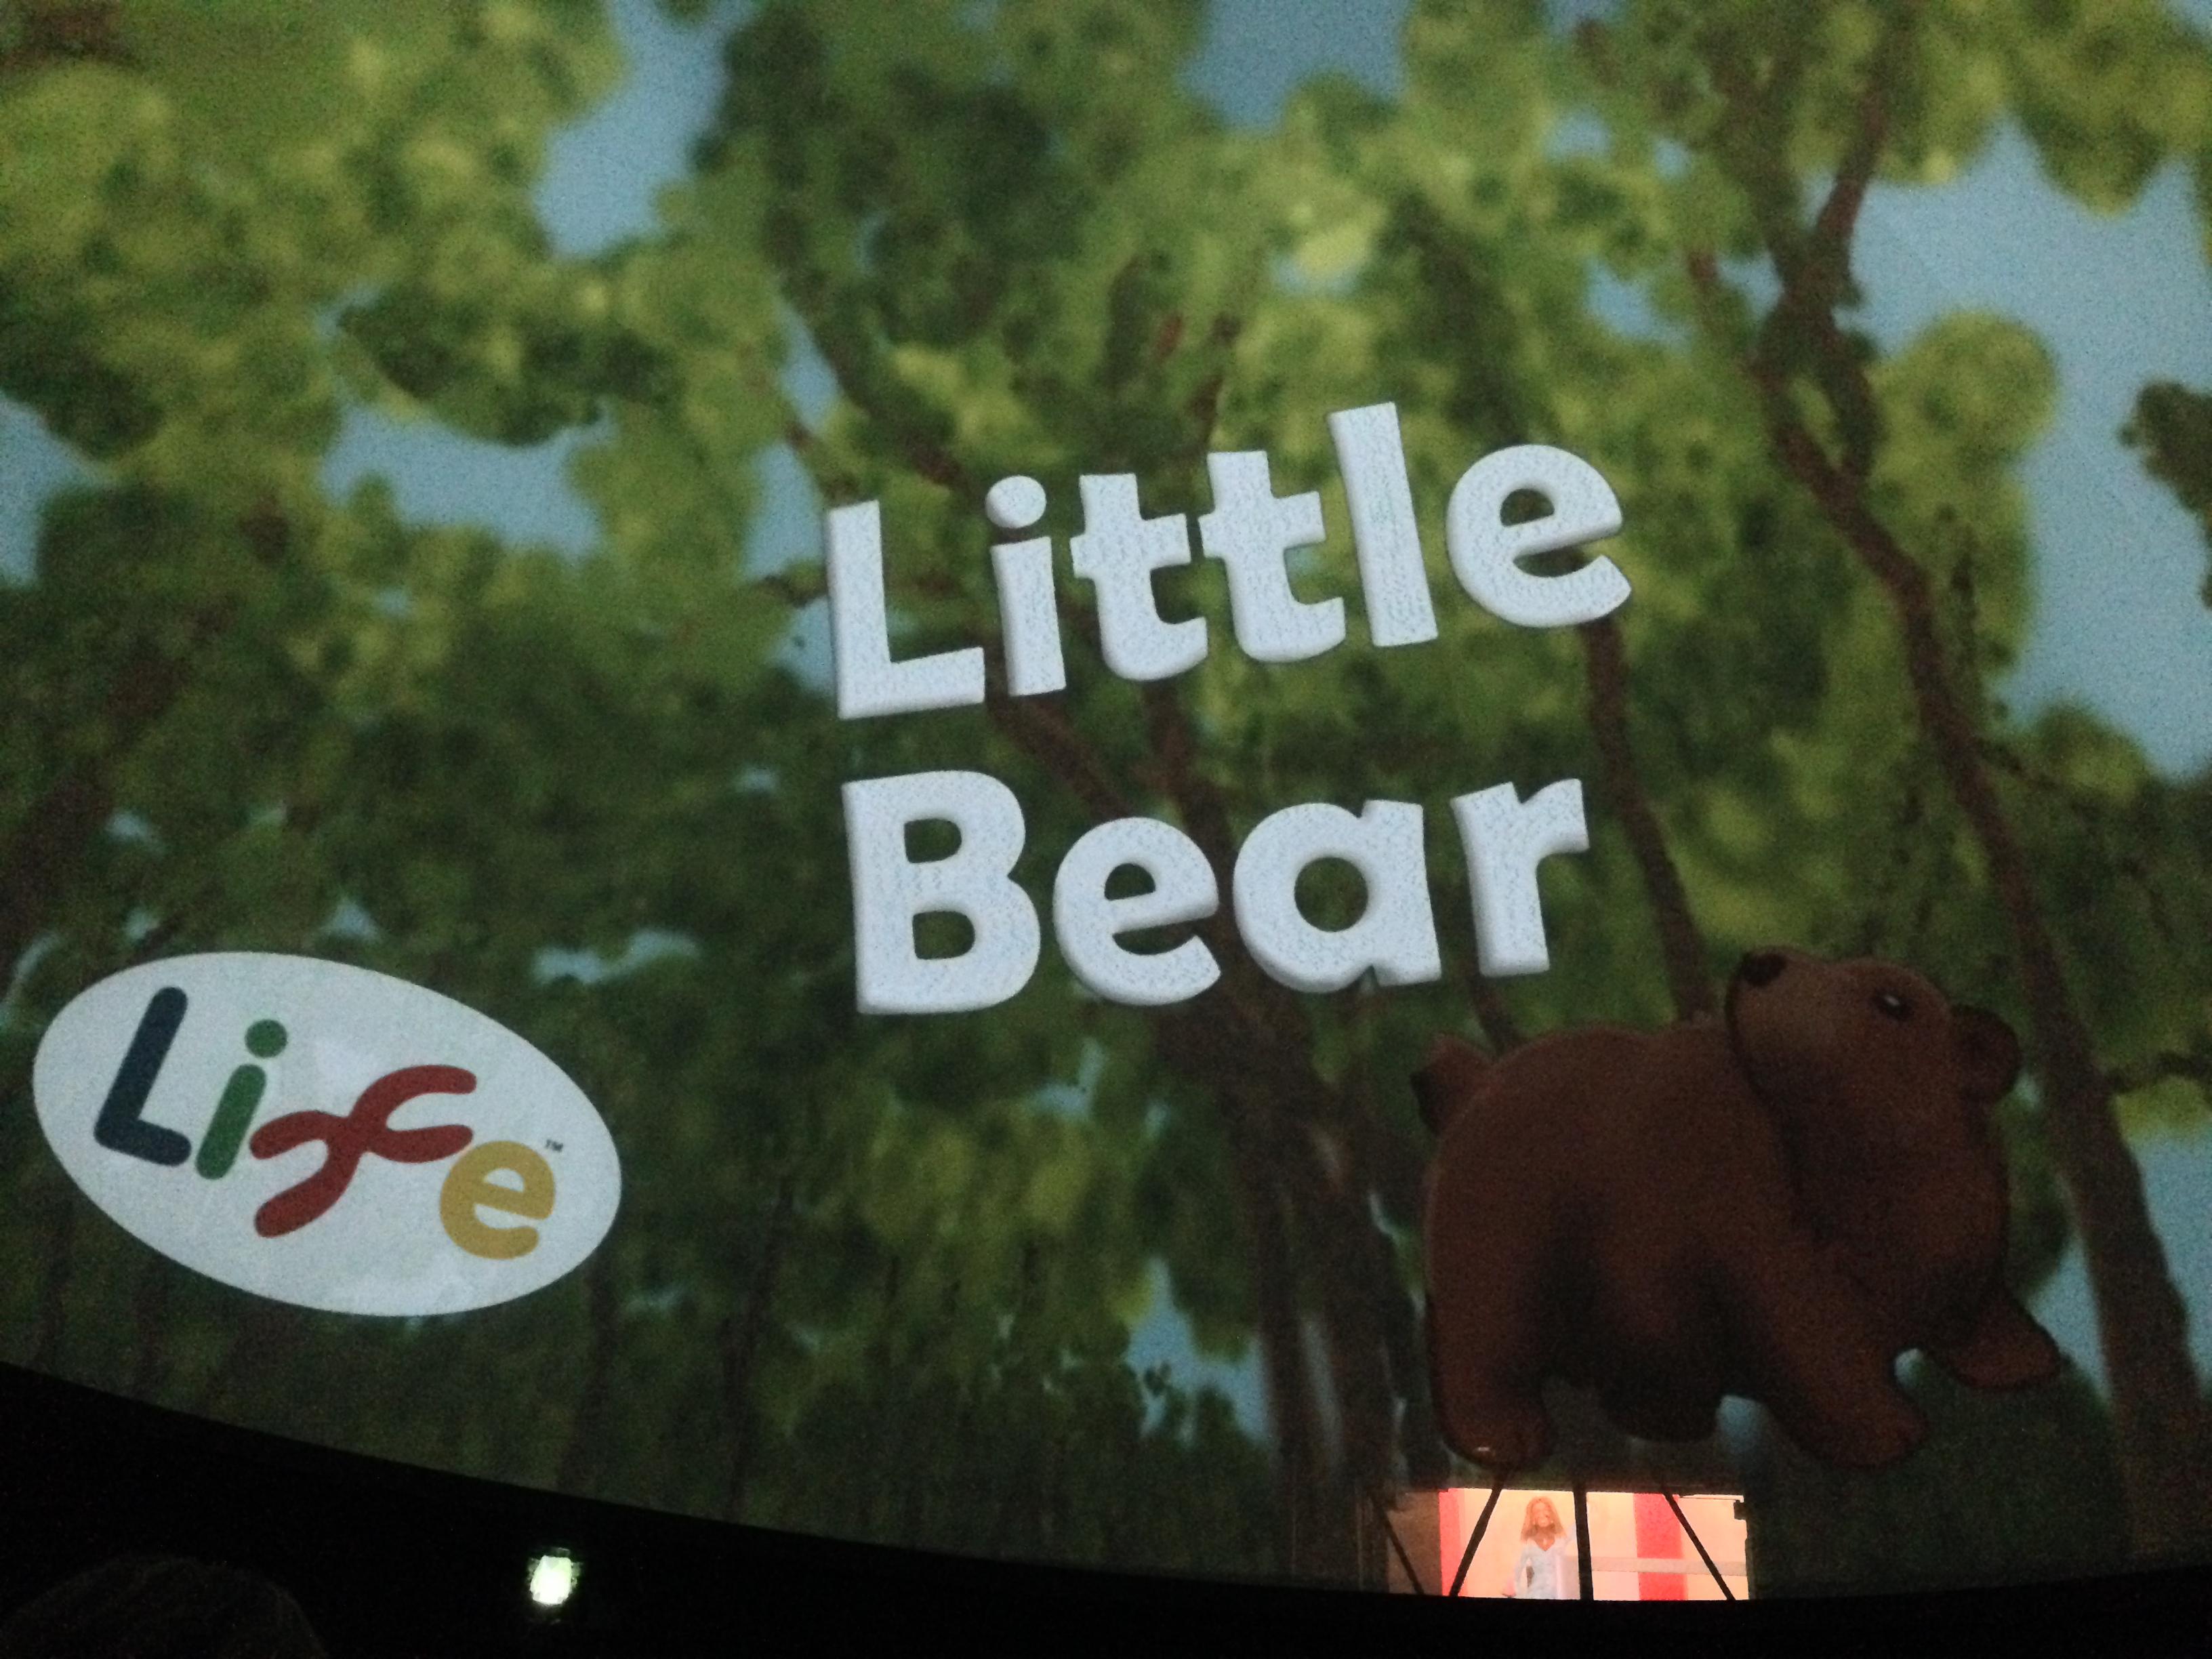 Planetarium show Little Bear at Centre for Life